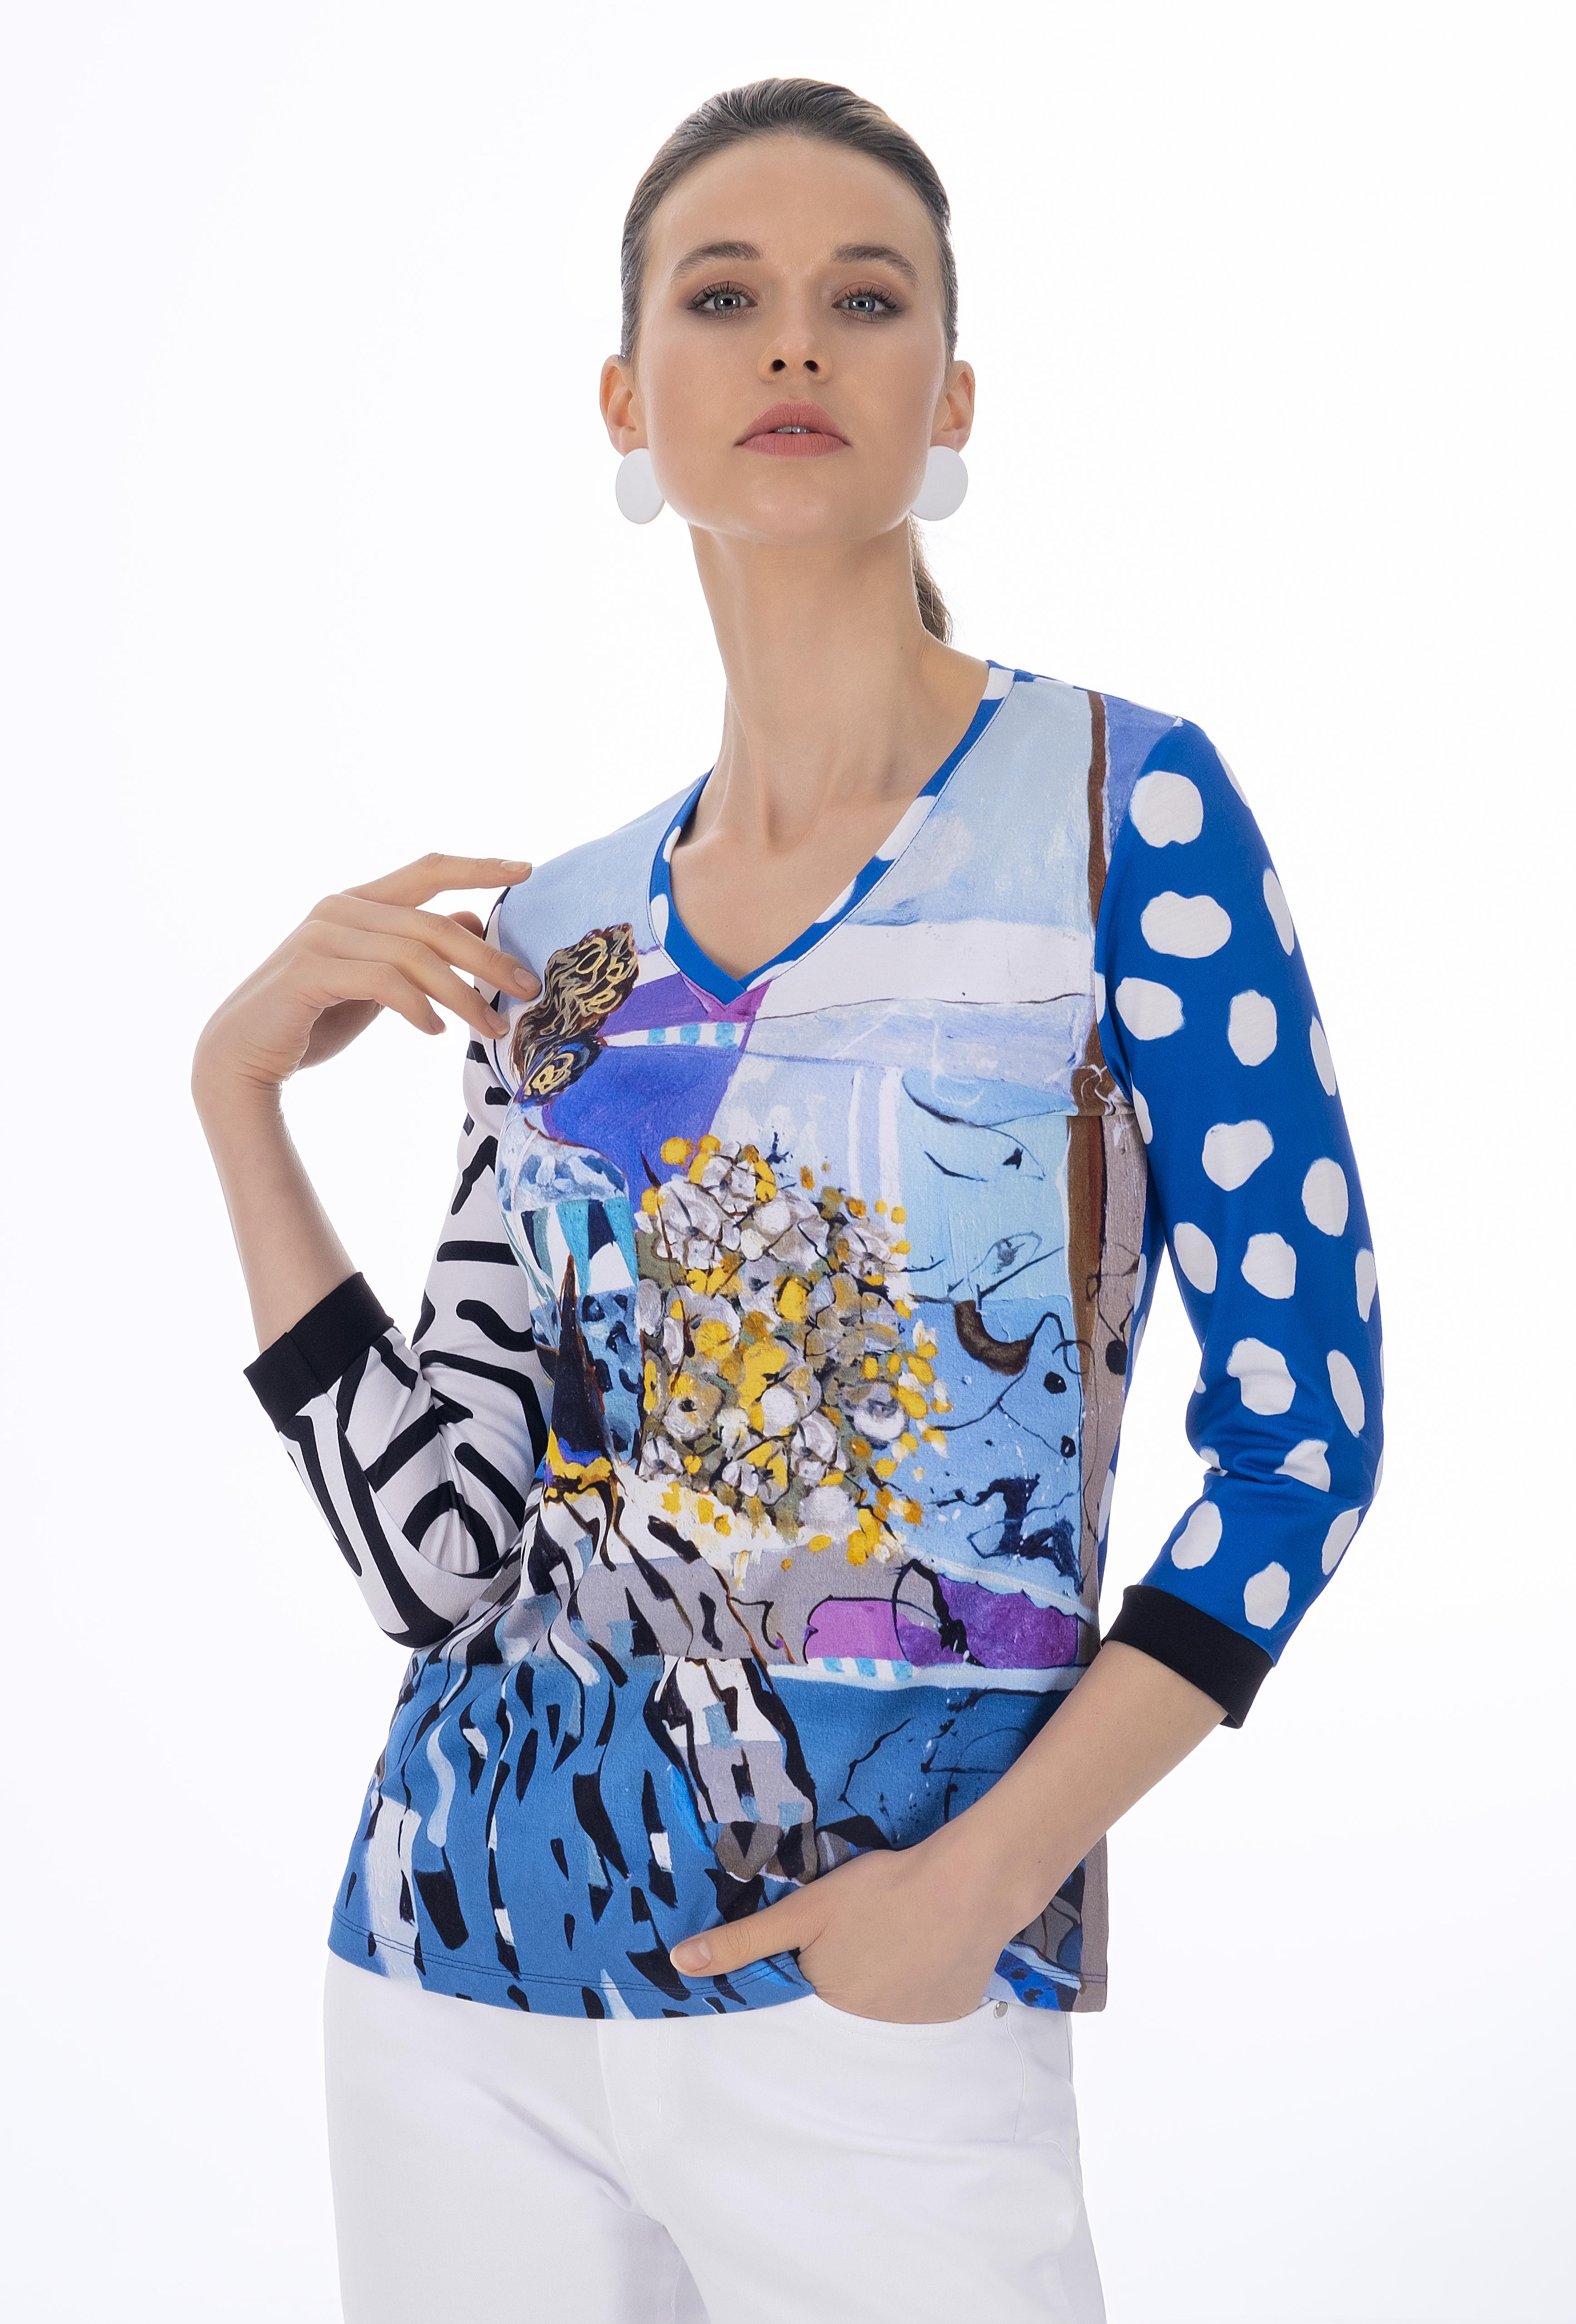 Simply Art Dolcezza: Princess Danae Abstract Art T-Shirt (Few Left!) Dolcezza_SimplyArt_21740